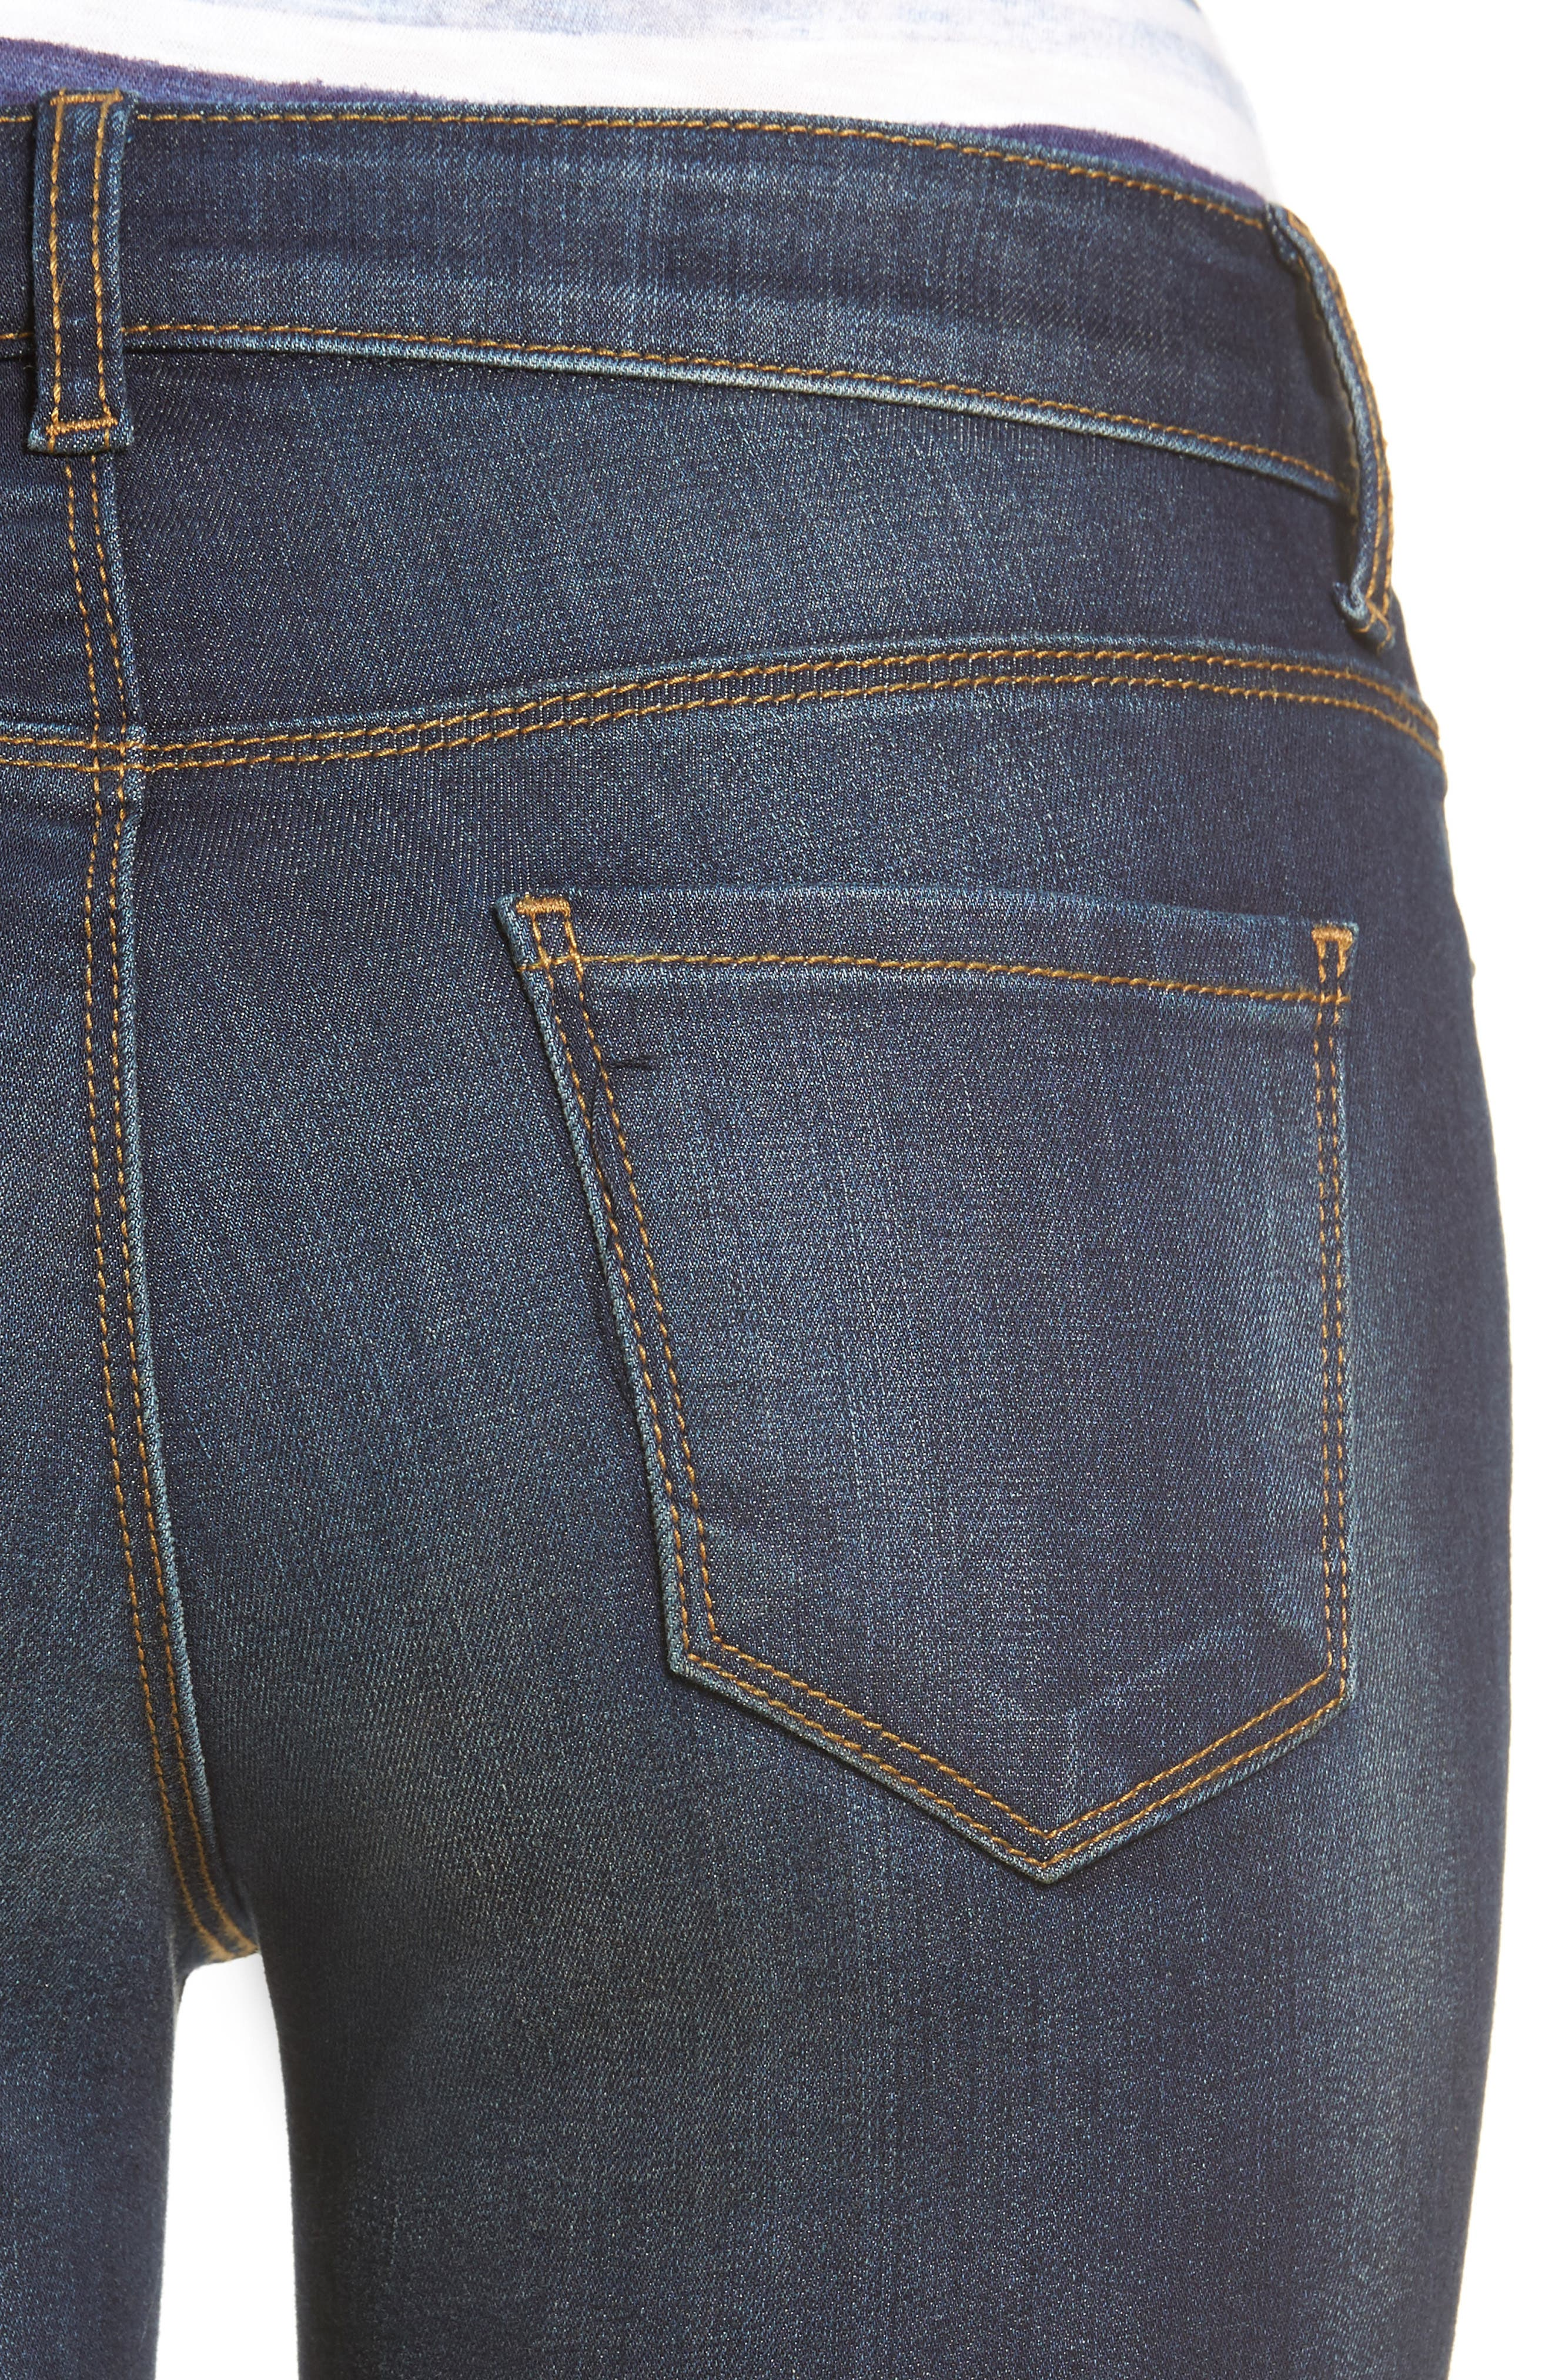 Kurvy Ankle Skinny Jeans,                             Alternate thumbnail 4, color,